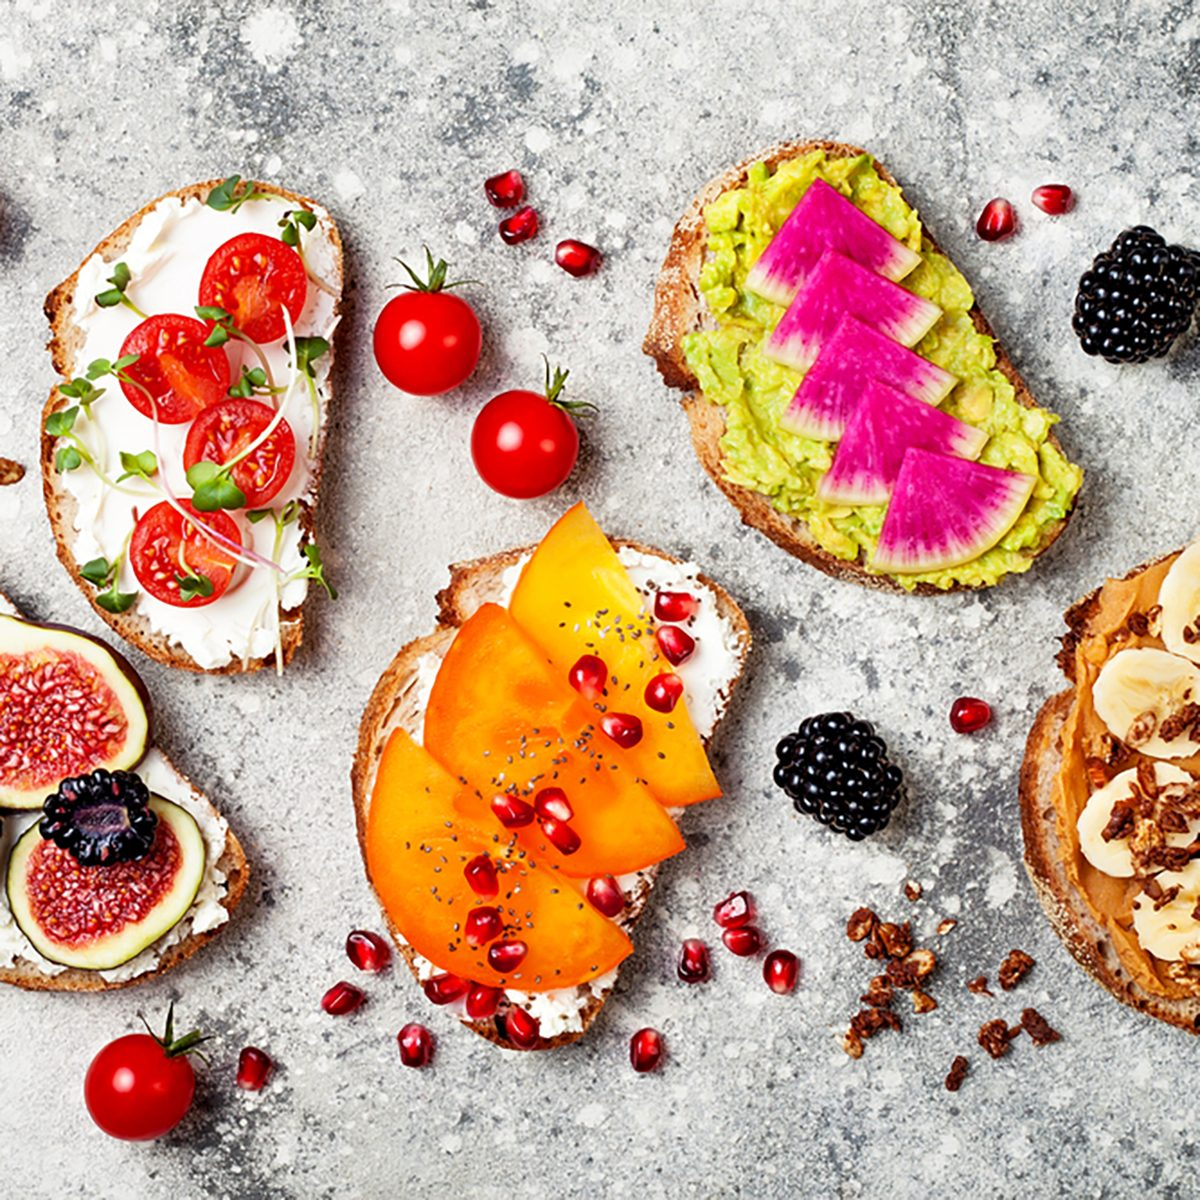 Healthy breakfast toasts with peanut butter, banana, chocolate granola, avocado, watermelon radish, persimmon, pomegranate, chia seeds, tomato, figs, blackberry